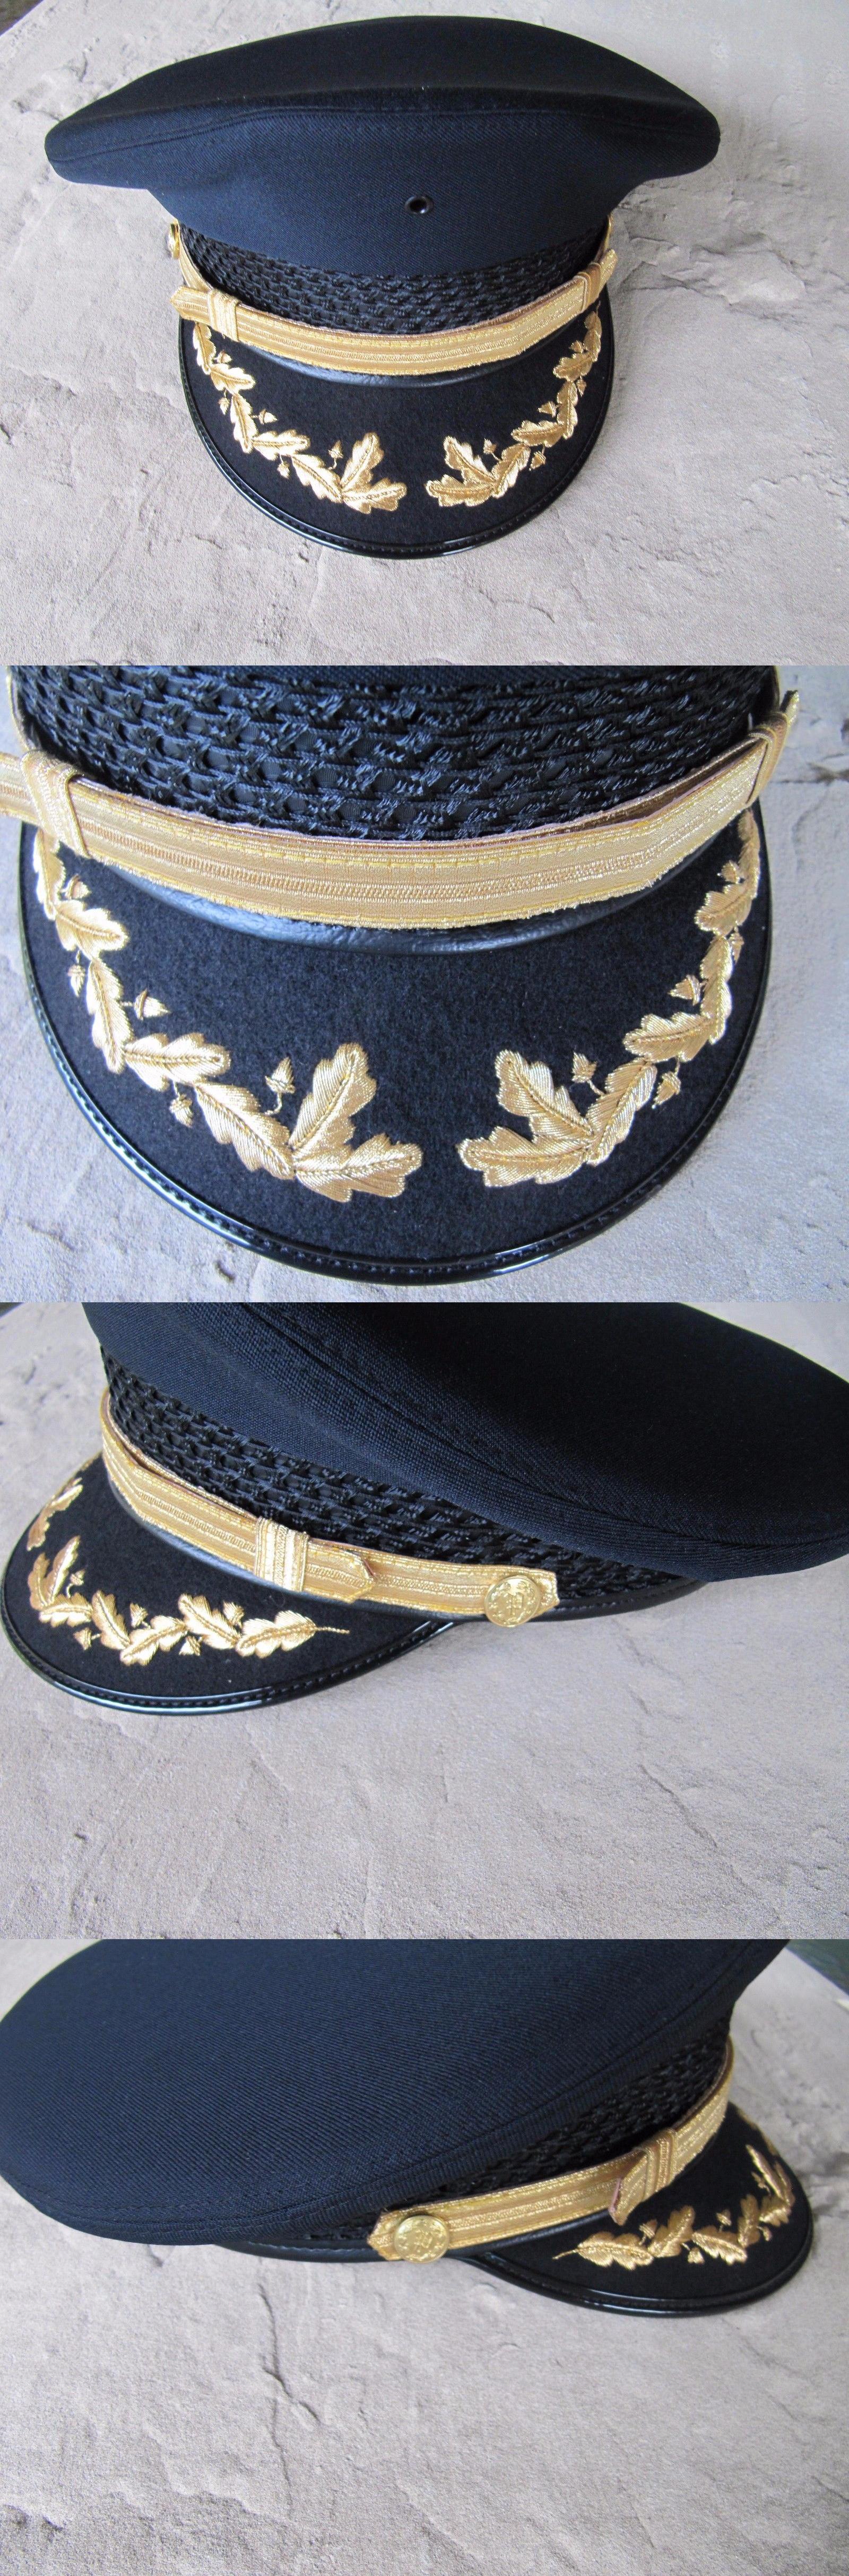 270d48786ac Hats 163526  Bayly Inc